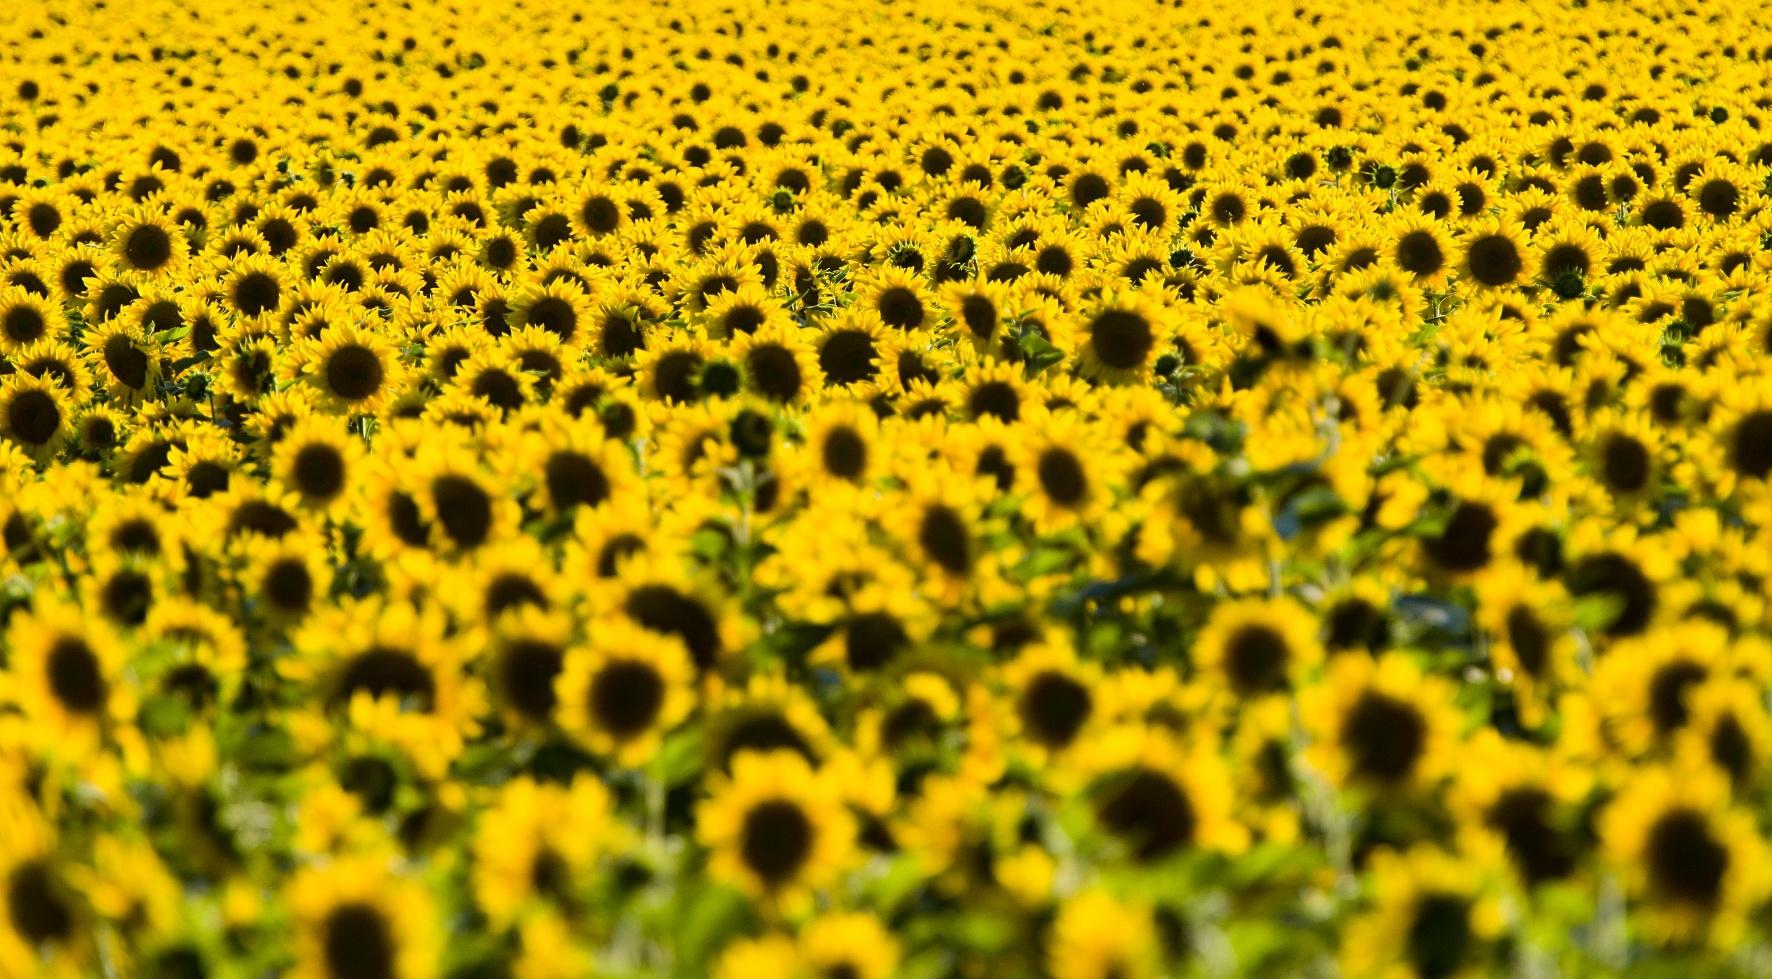 Unsere Öko-Sorten - Sonnenblumen